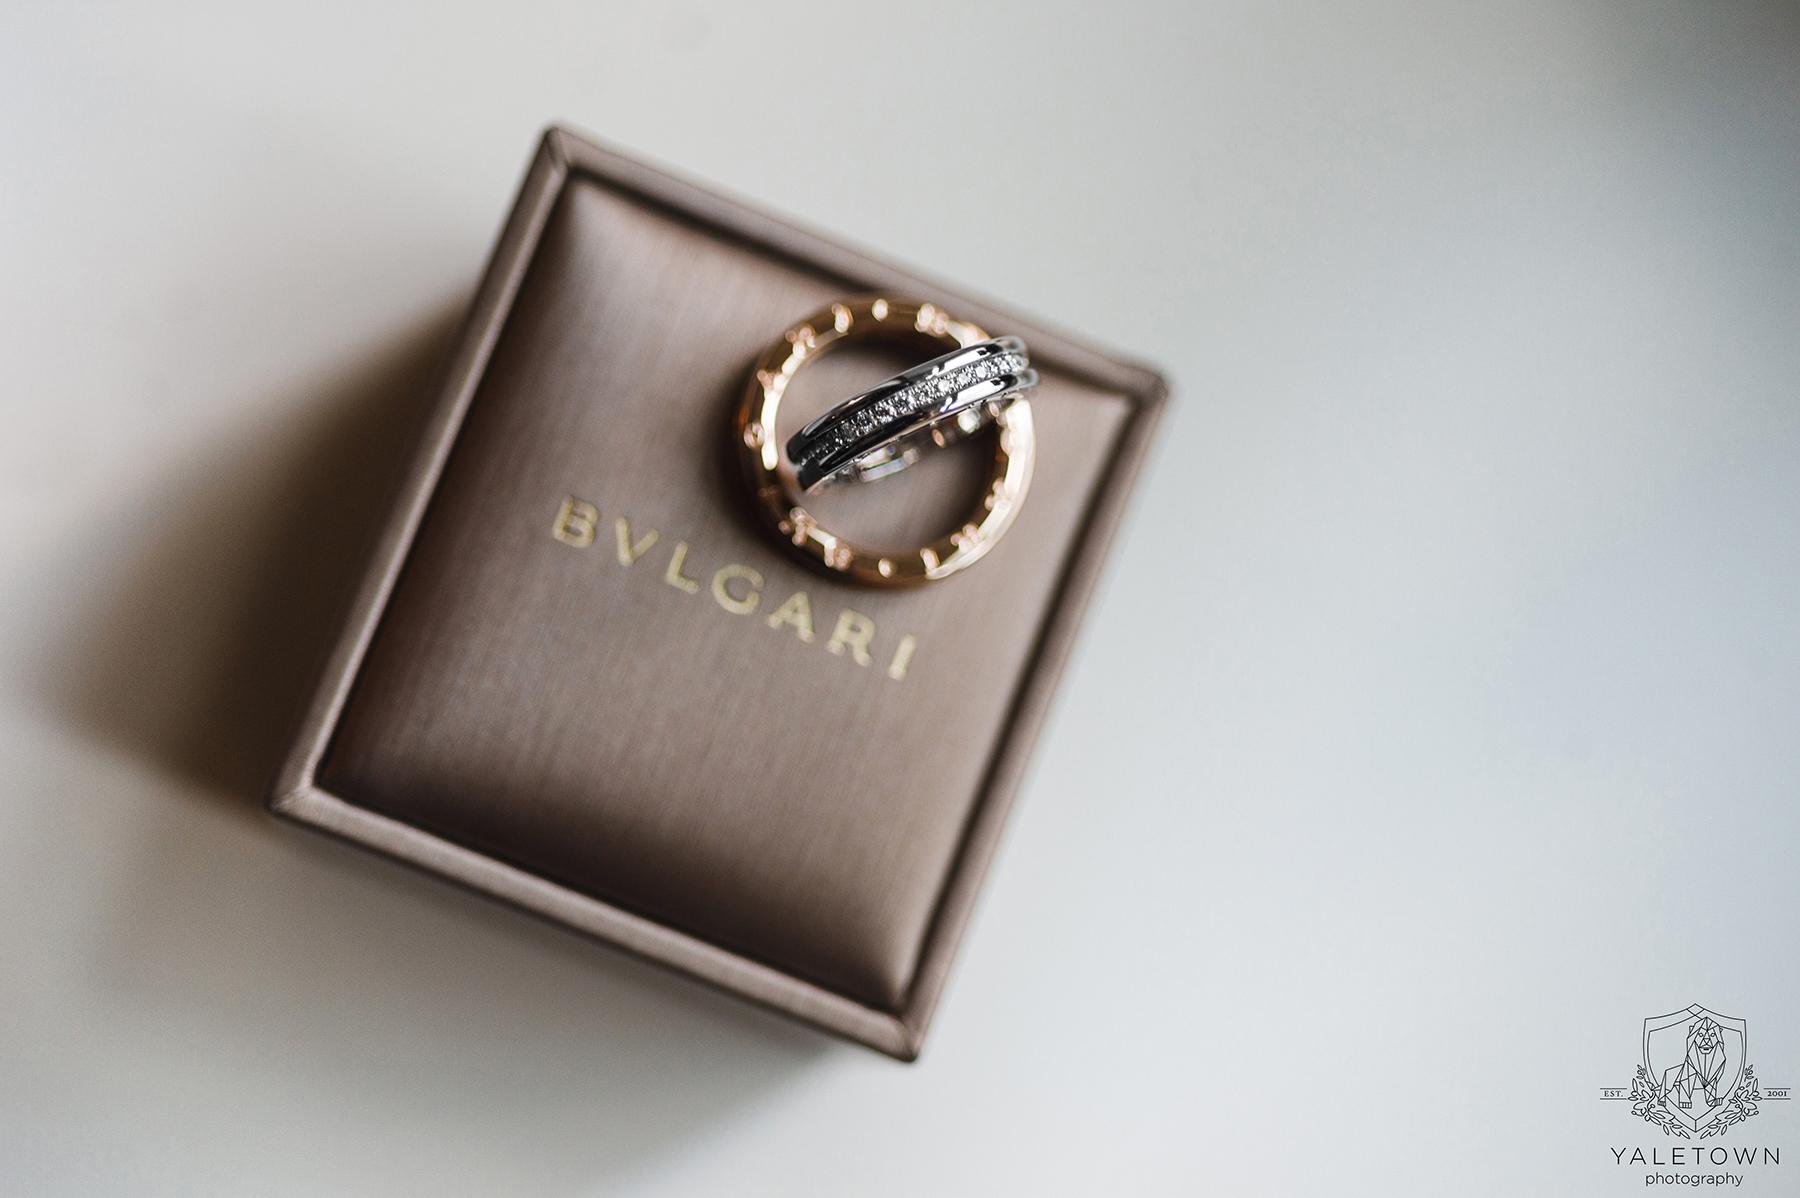 Bulgari-Wedding-Rings-Rosewood-Hotel-Georgia-Vancouver-Wedding-Yaletown-Photography-photo